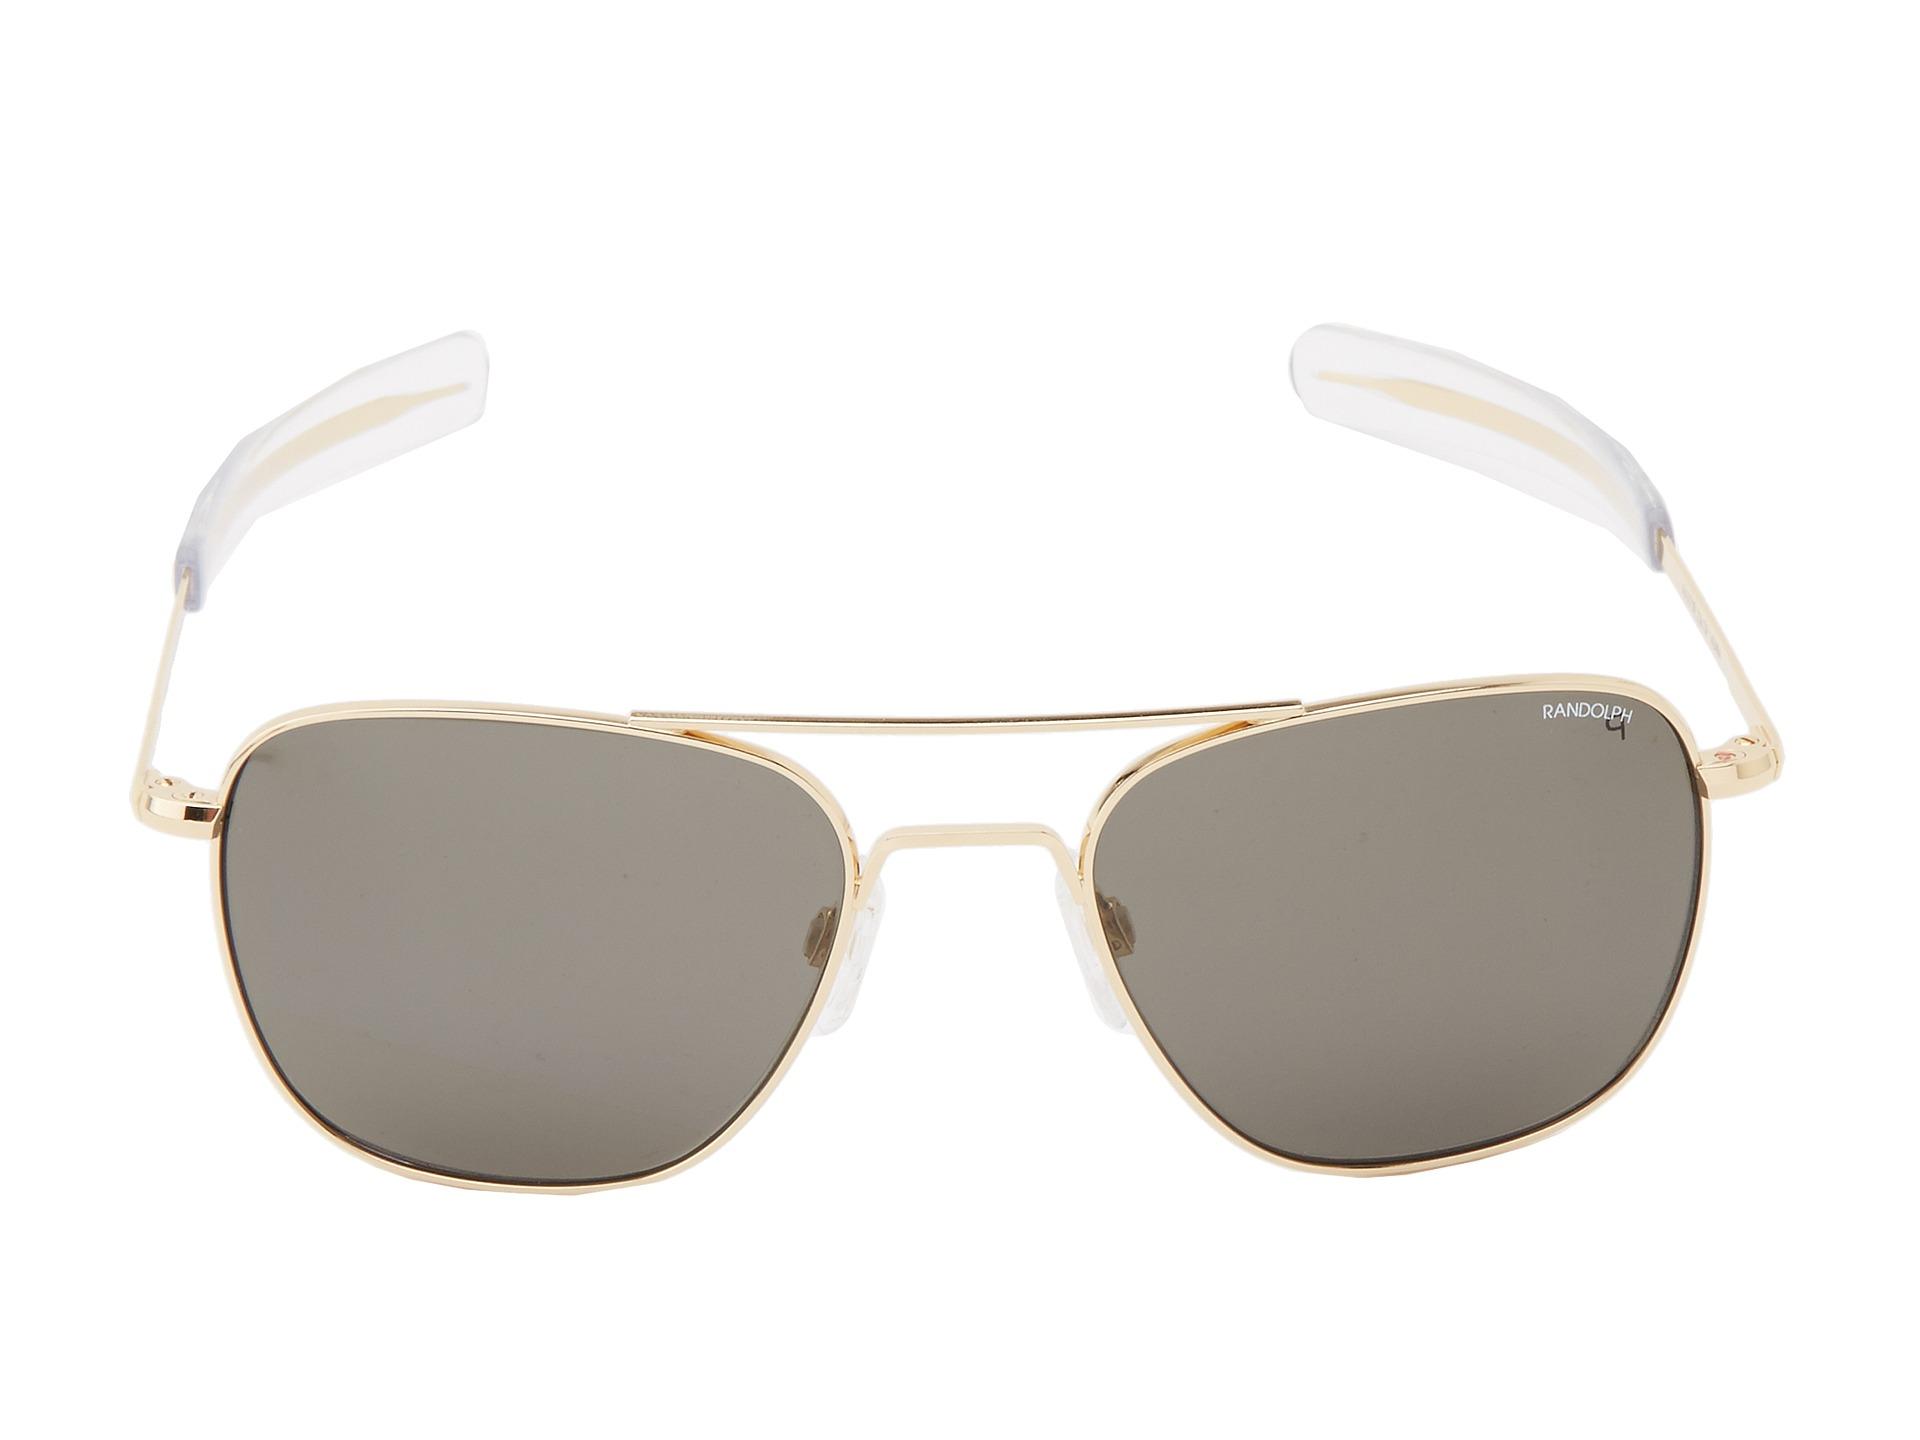 38ad052cb1 Randolph Aviator 55mm Sunglasses Reviews - Bitterroot Public Library